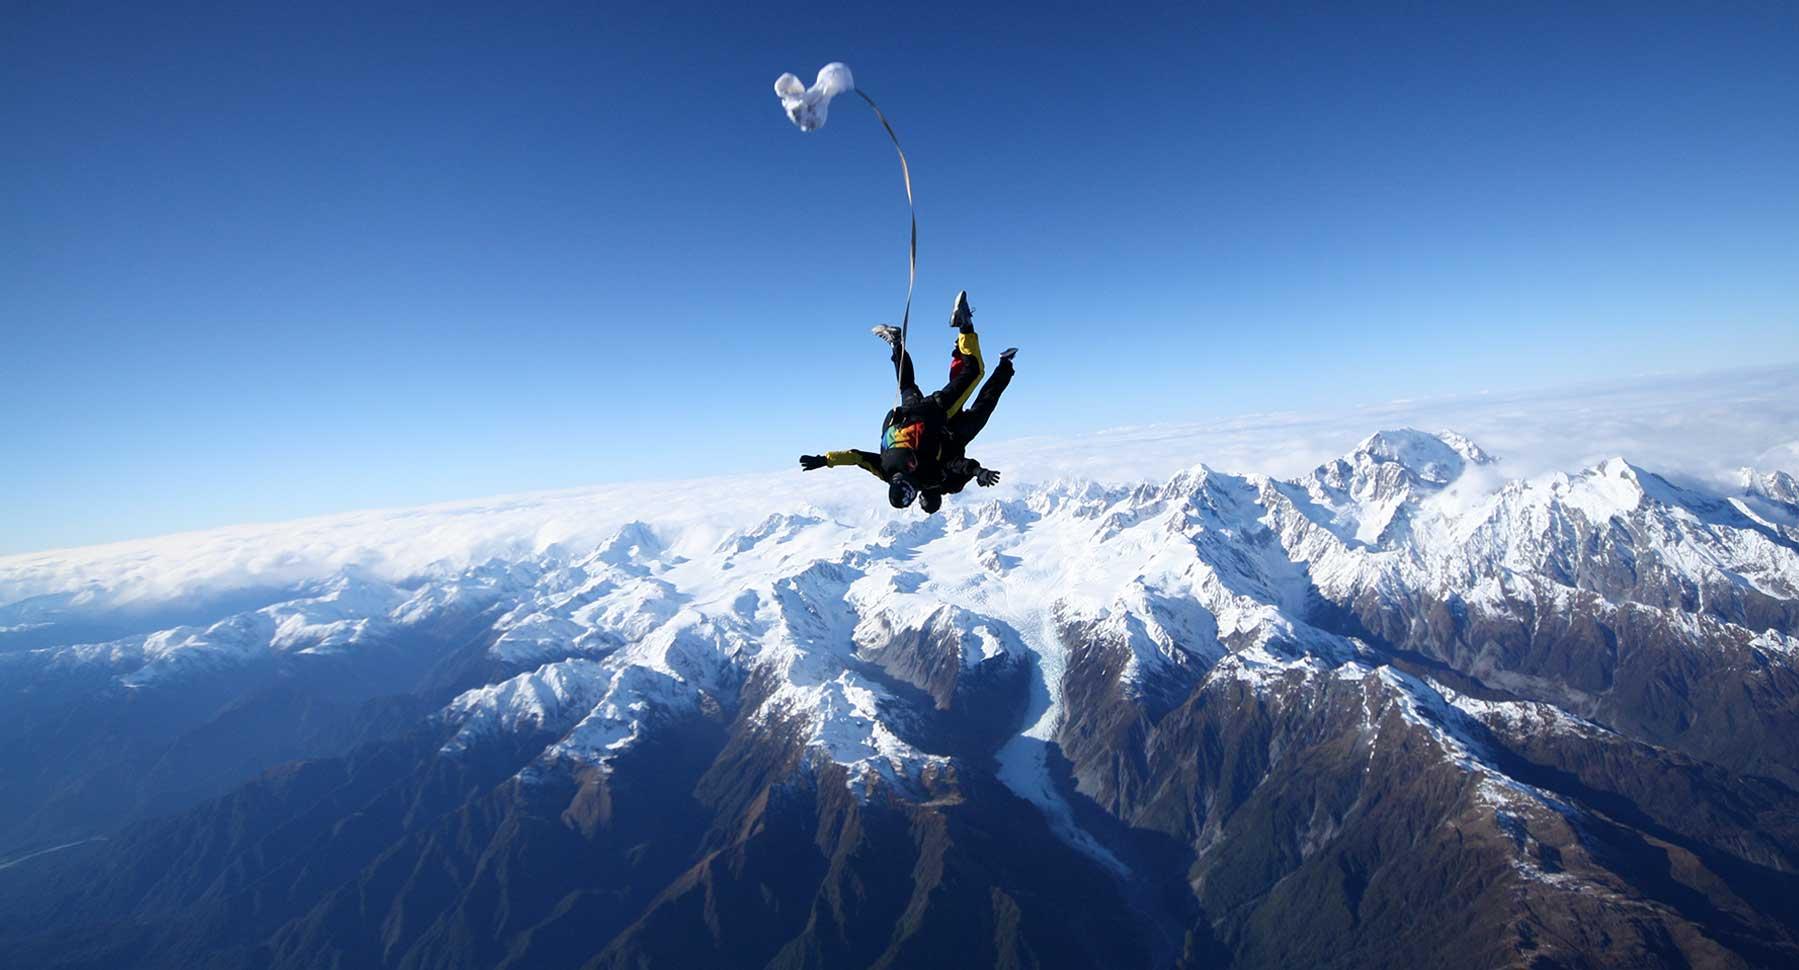 newzealand skydiving - skydiving